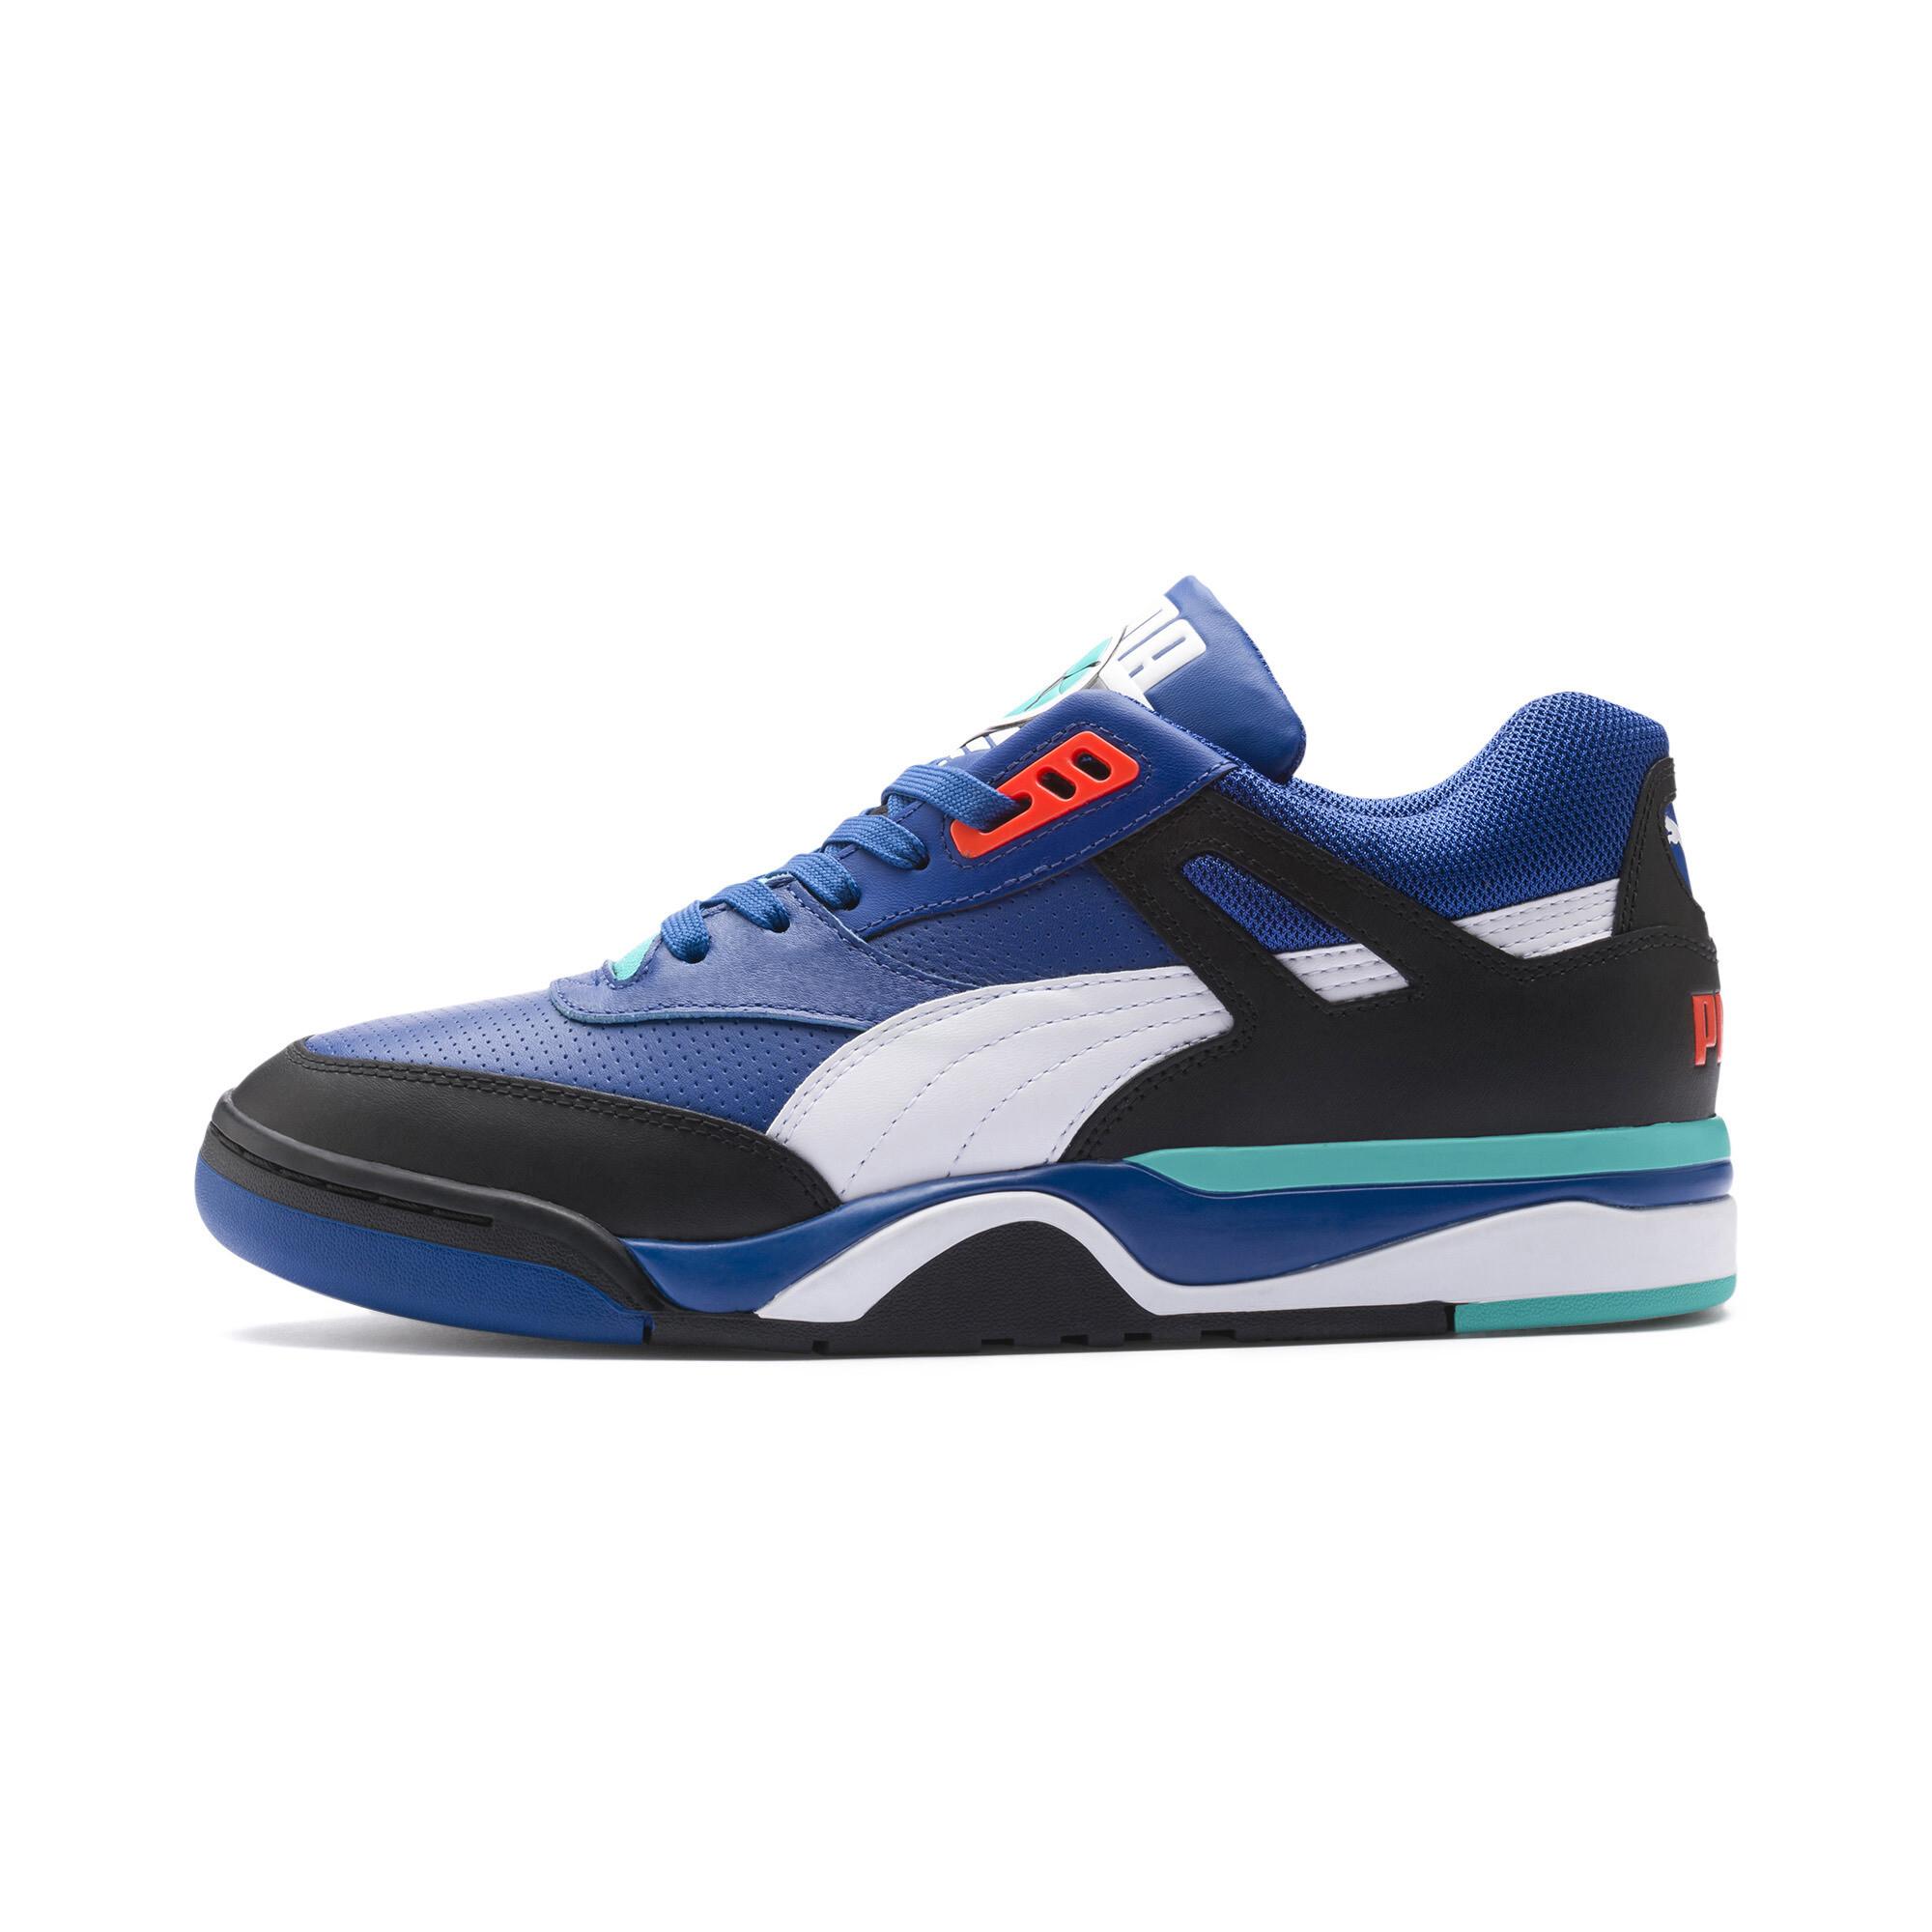 Indexbild 37 - PUMA Palace Guard Sneaker Unisex Schuhe Sport Classics Neu